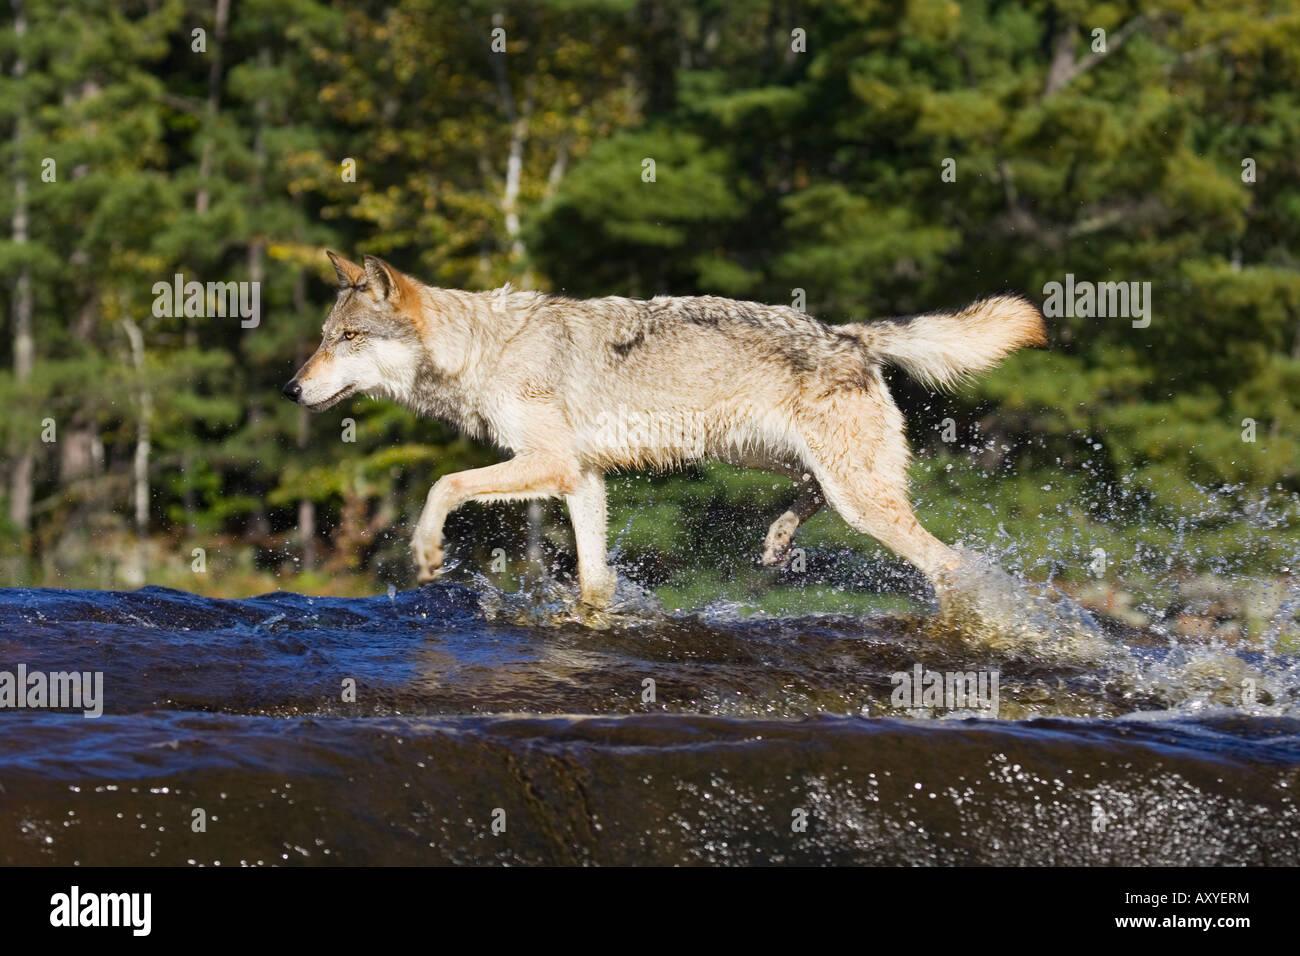 Gray wolf (Canis lupus) running through water, in captivity, Minnesota Wildlife Connection, Sandstone, Minnesota, - Stock Image